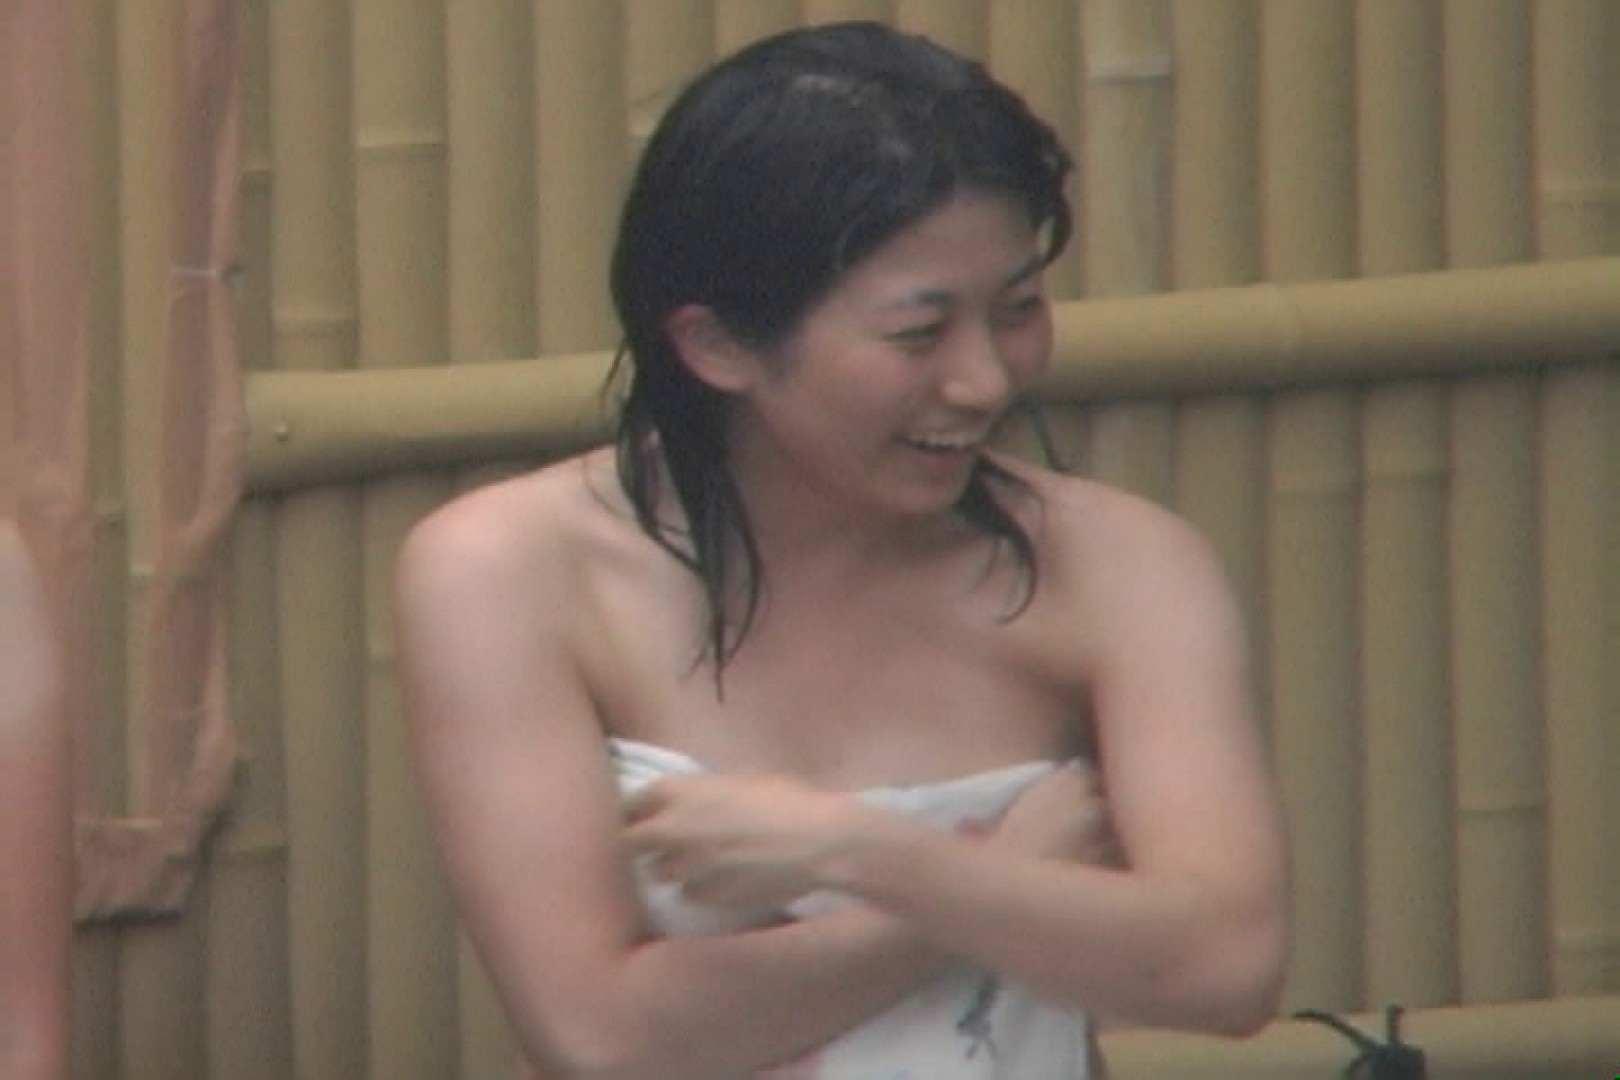 Aquaな露天風呂Vol.43【VIP限定】 露天 のぞき動画画像 88画像 80